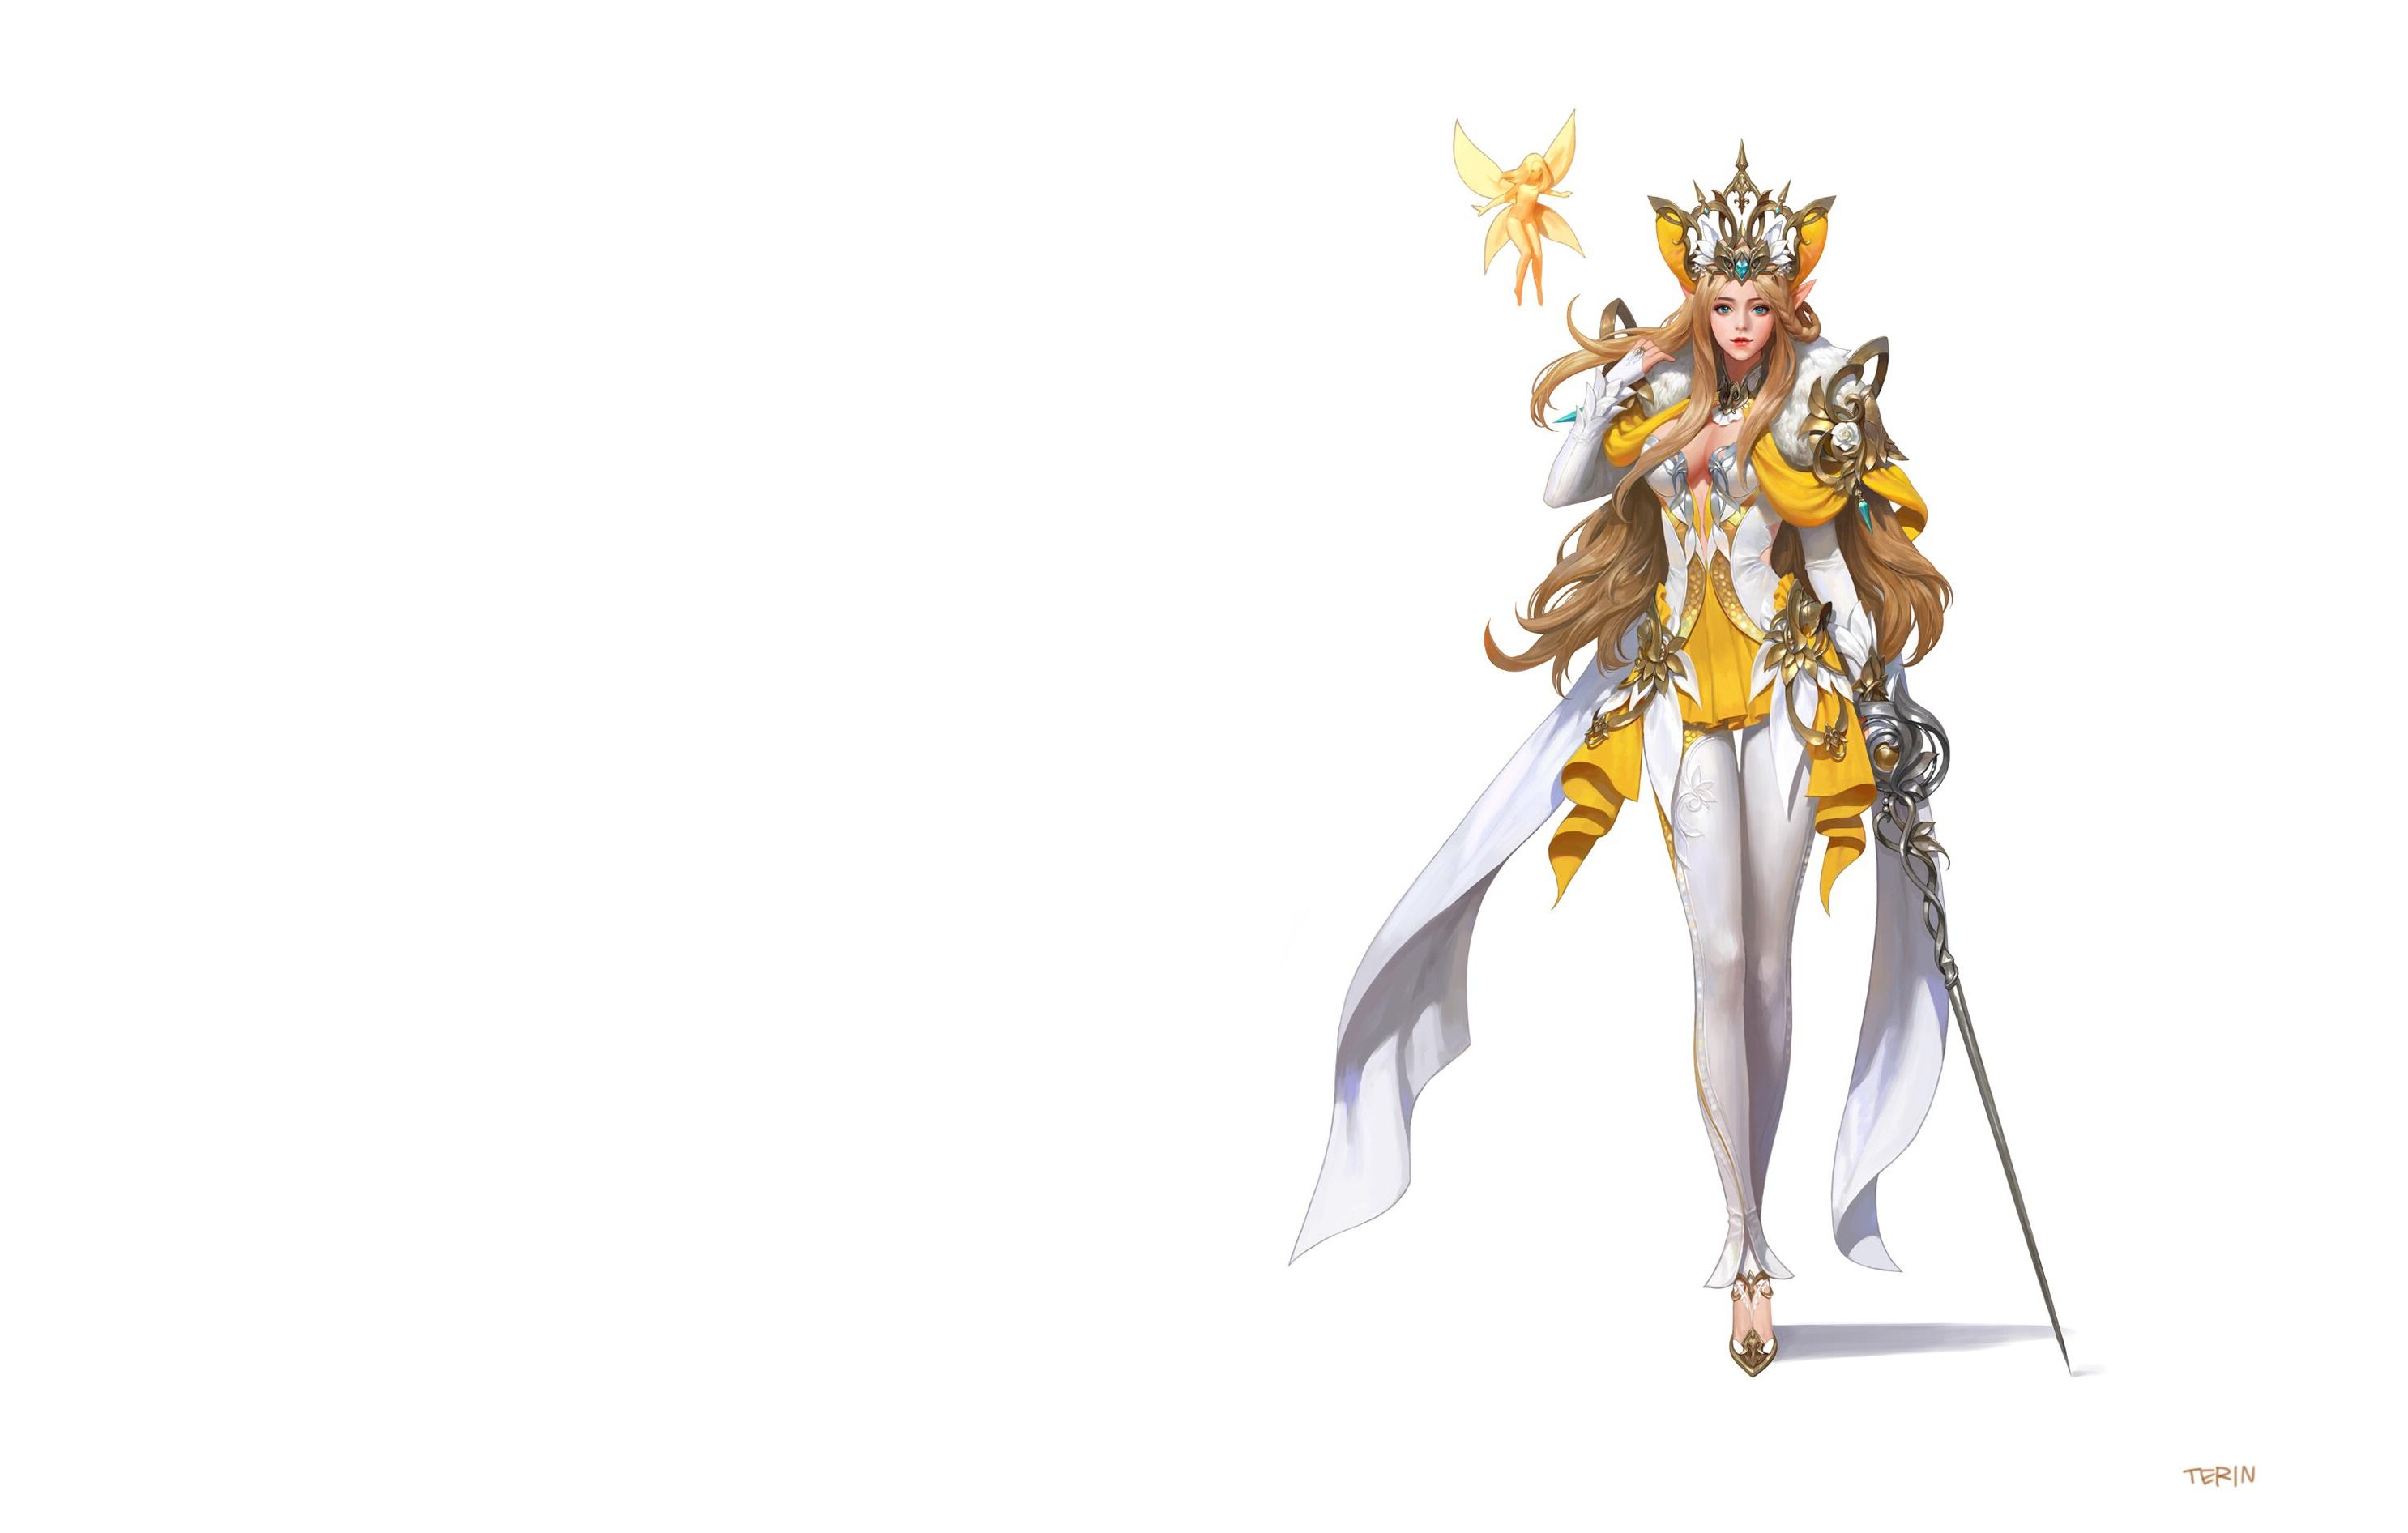 Wallpaper Knight rapier Elf Crown Warriors terin kim Beautiful Fantasy young woman White background Épée Elves warrior Girls female